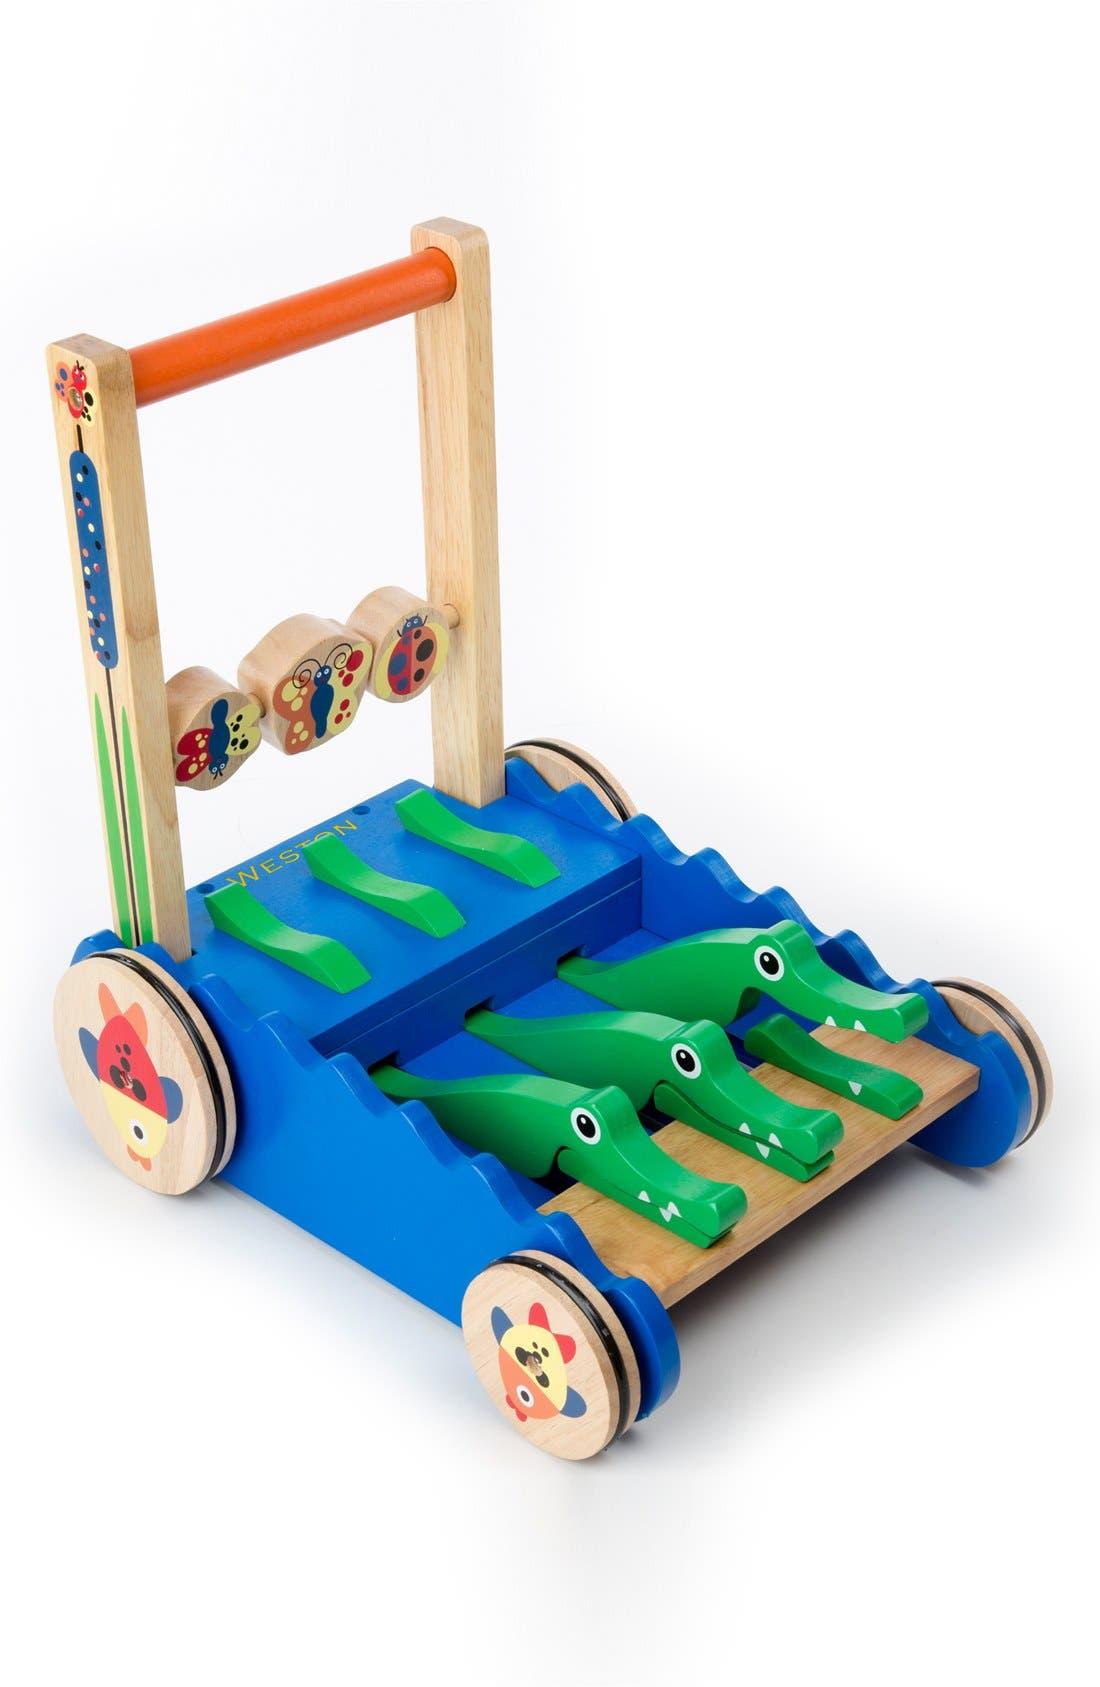 'Chomp & Clack' Personalized Alligator Push Toy,                         Main,                         color, BLUE